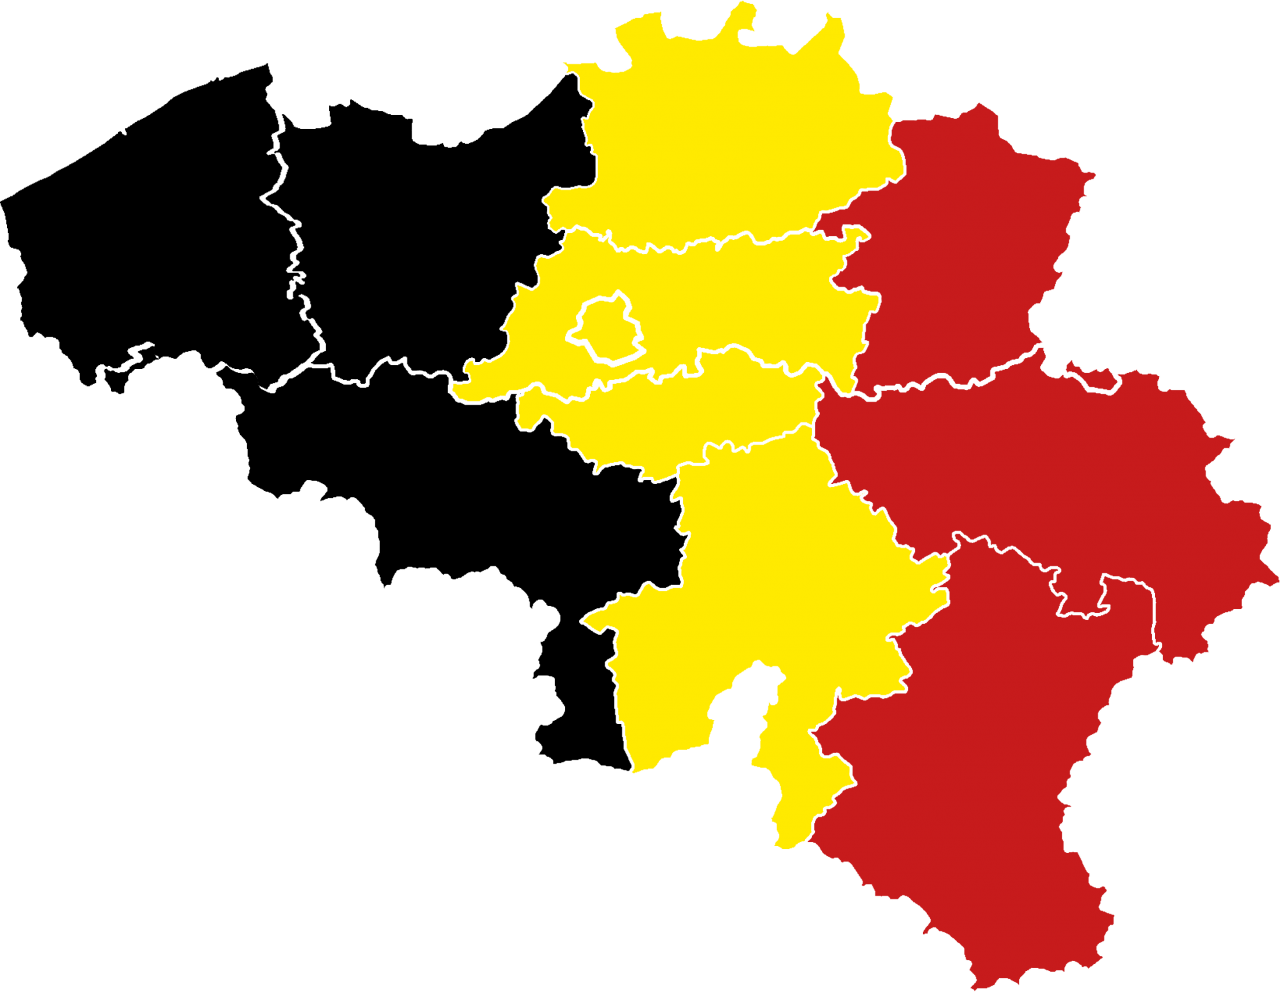 Map of Belgium PNG Image